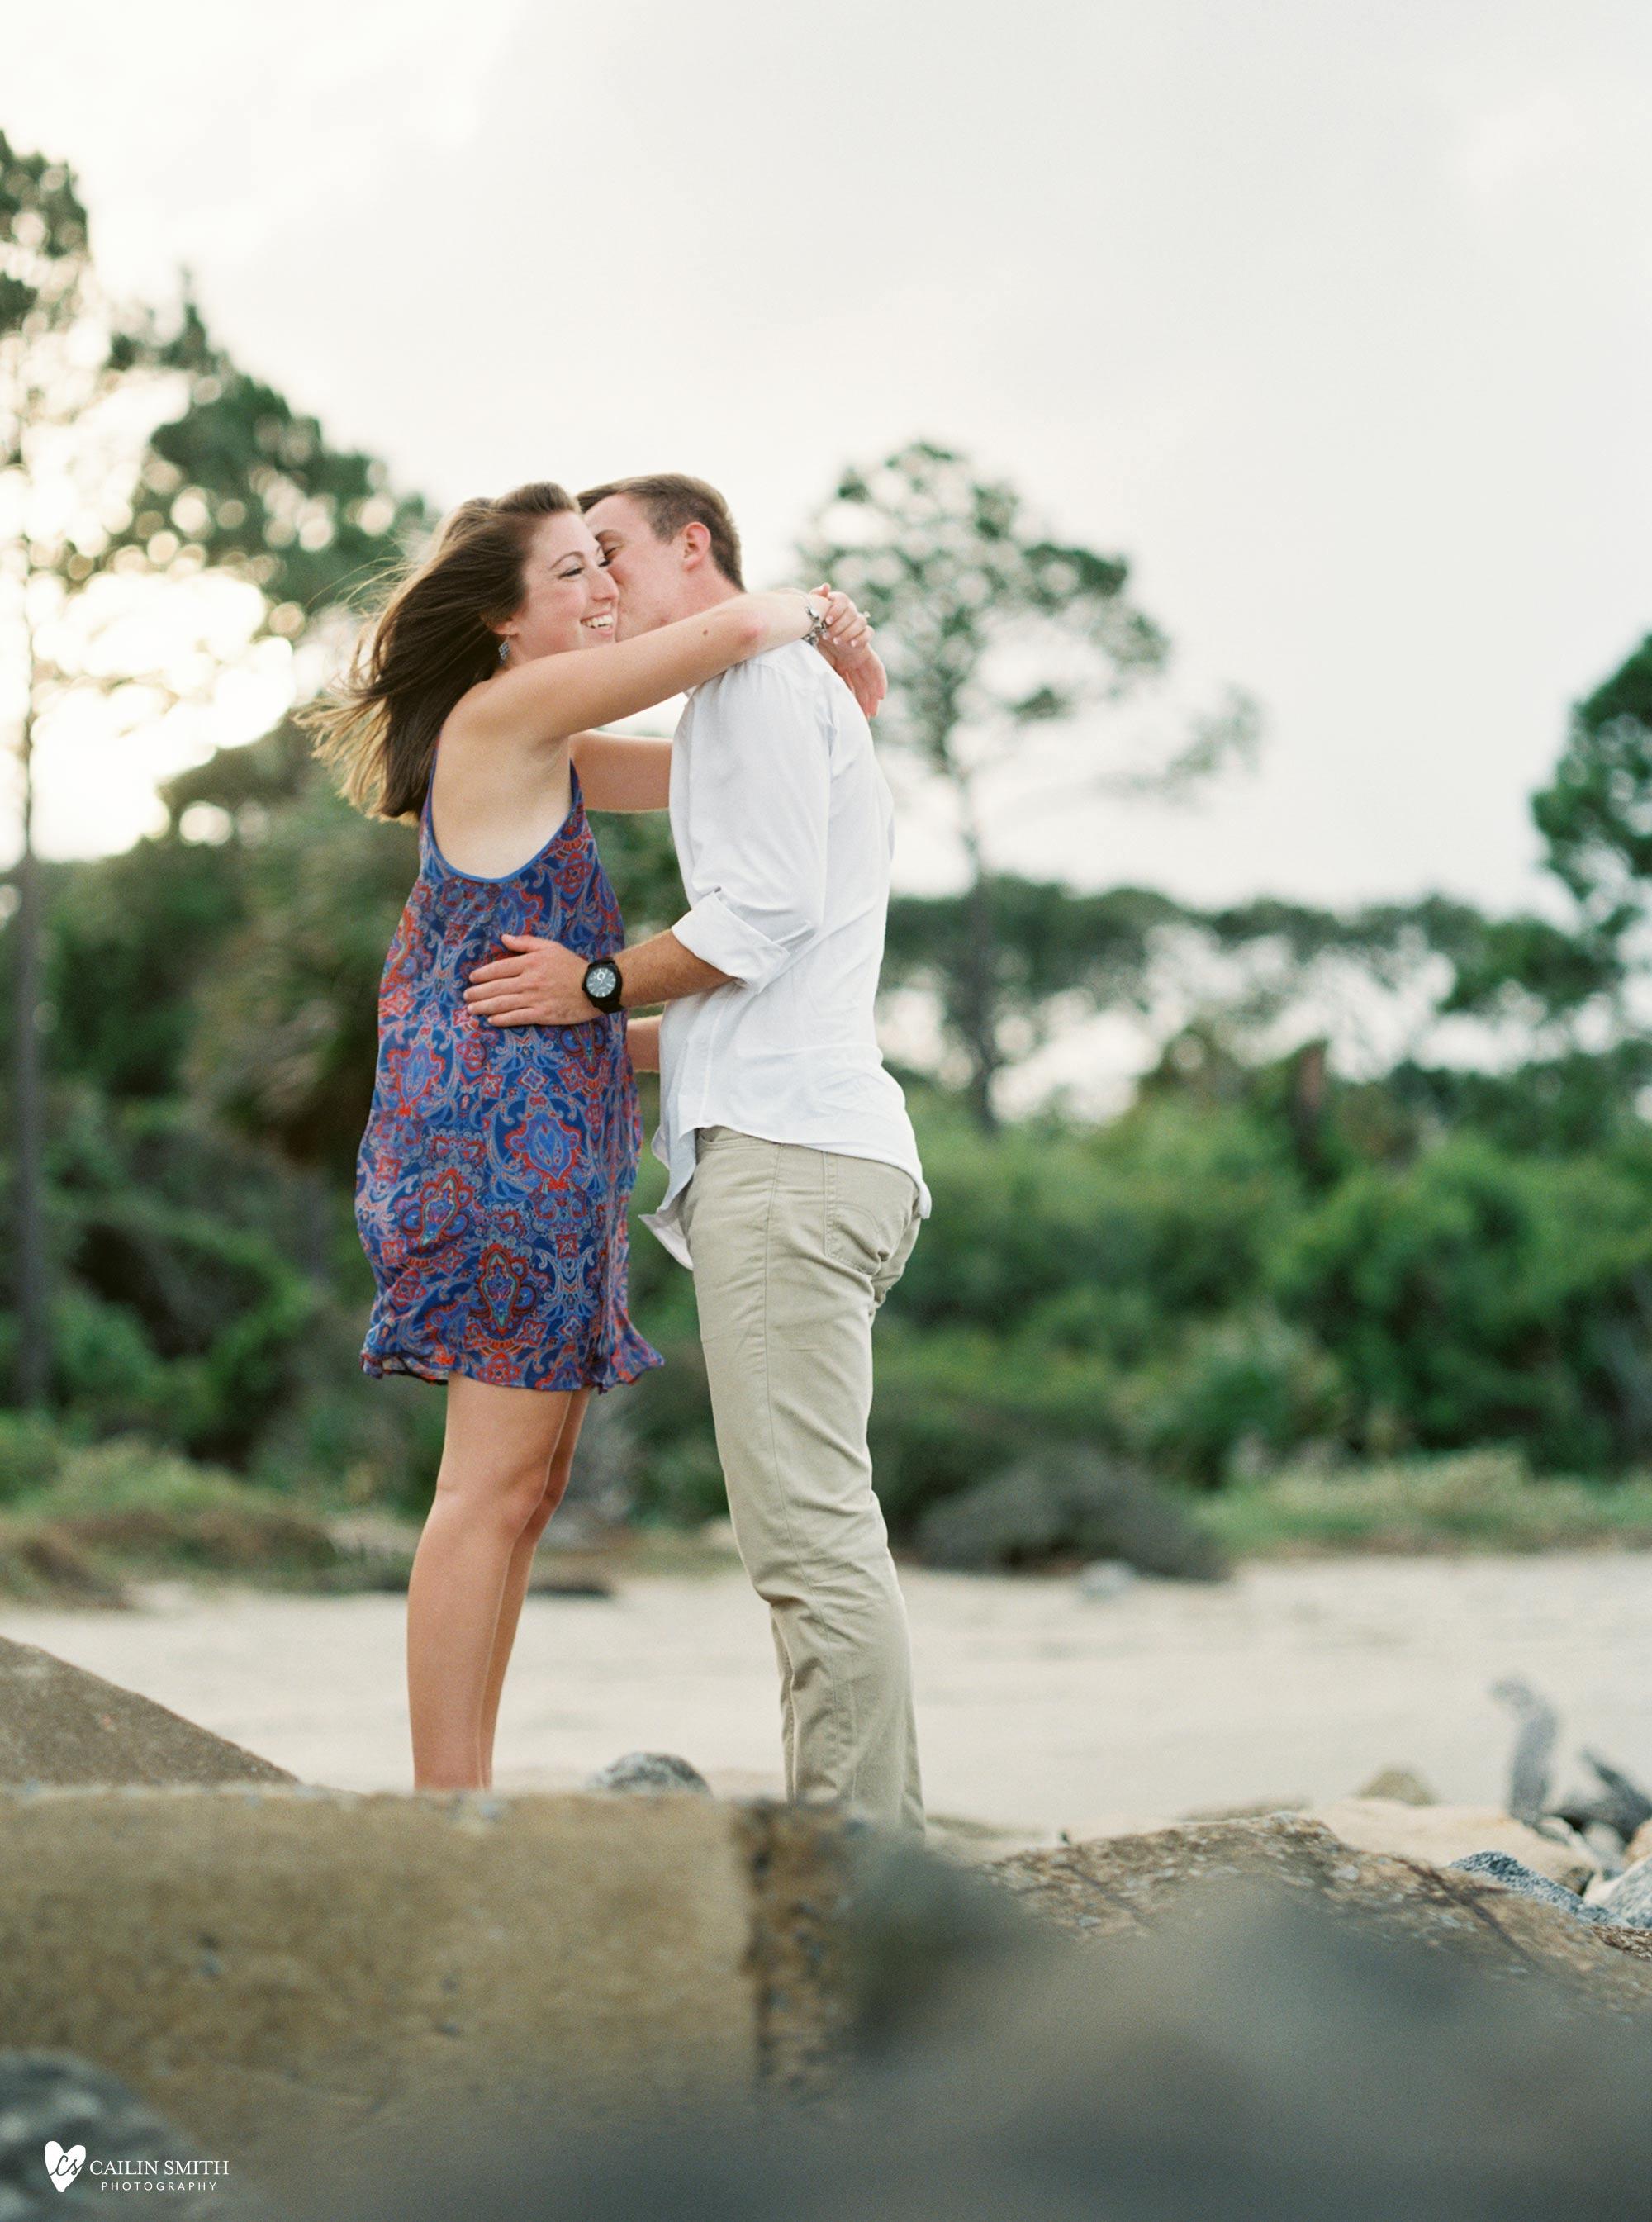 Jacqueline_Matt_Jekyll_Island_Engagement_Photography_Driftwood_Beach_Engagement_14.jpg